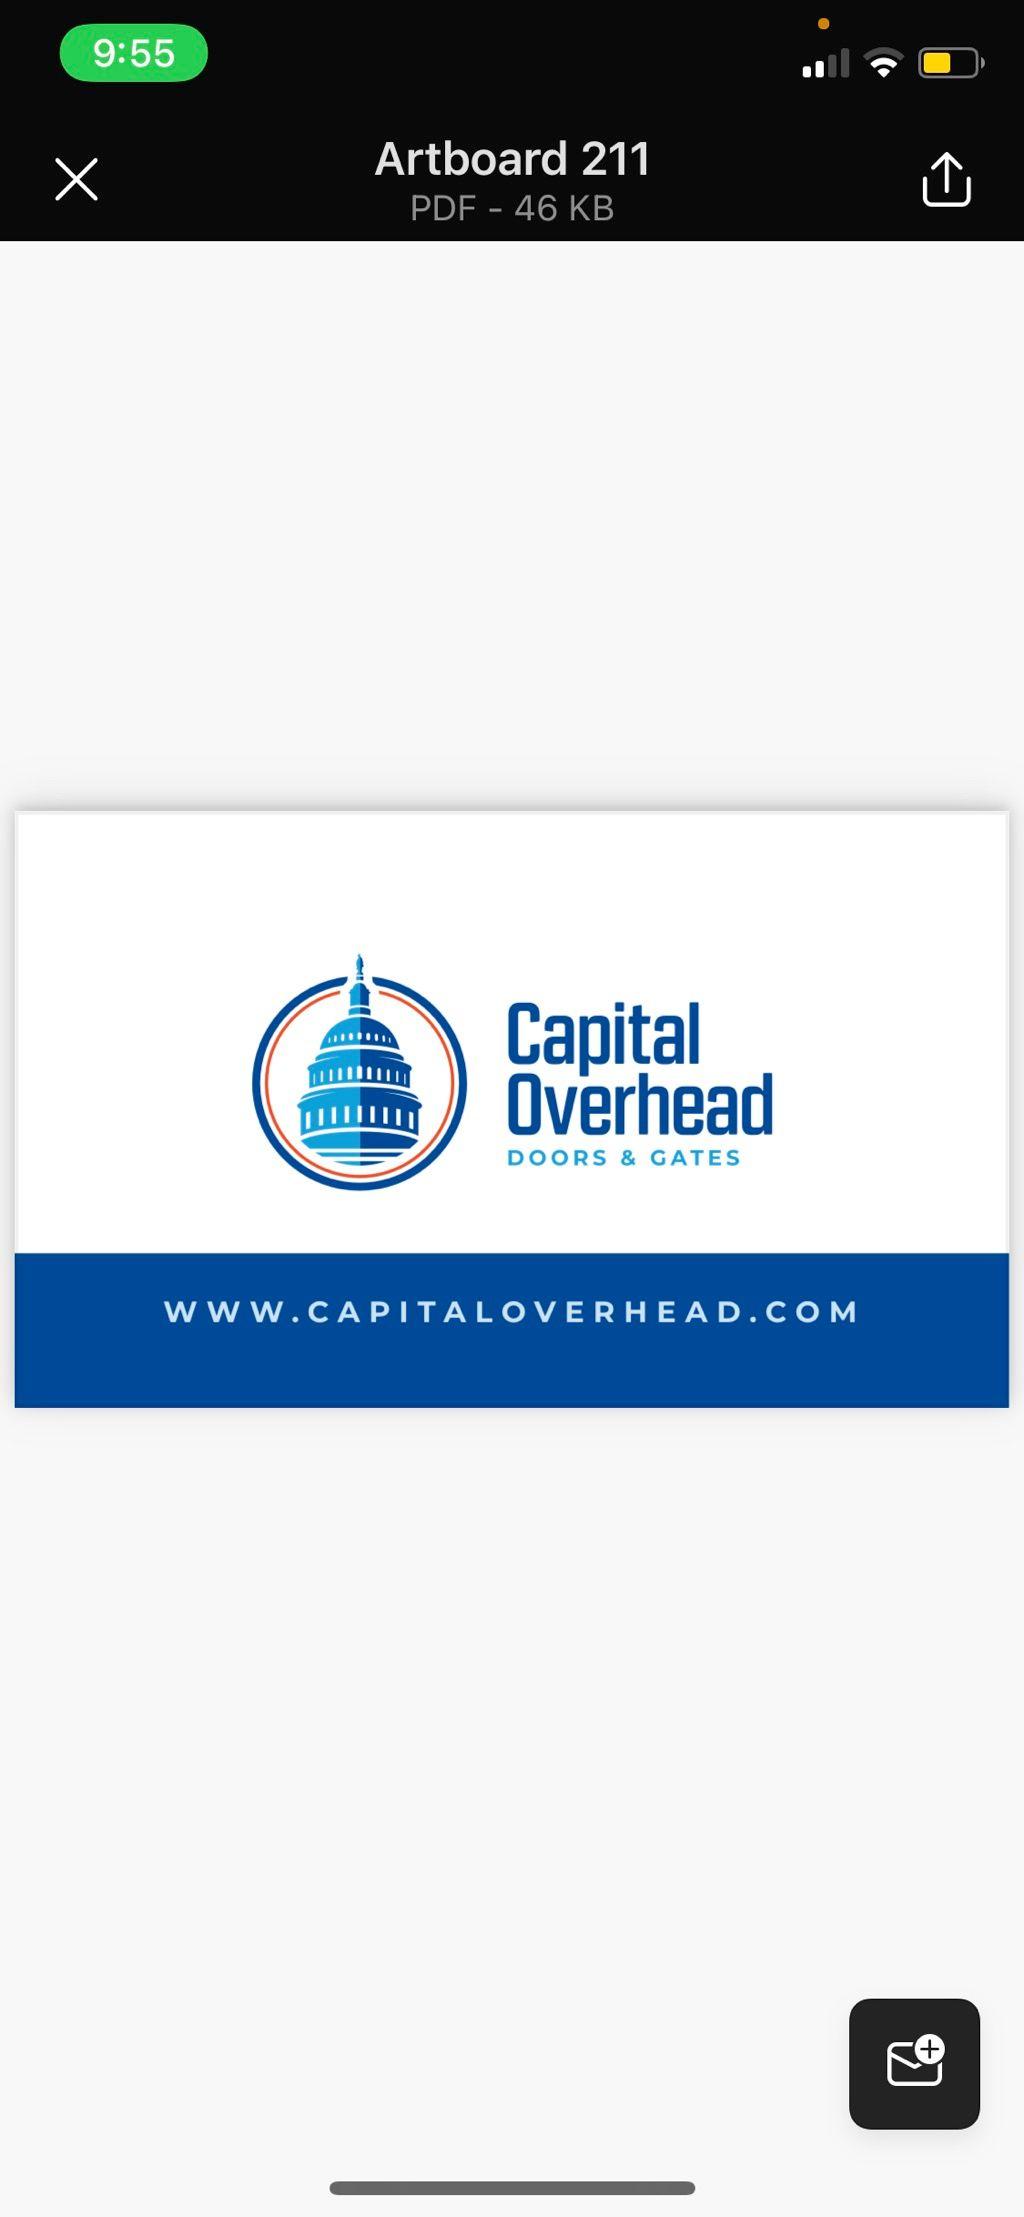 Capital Overhead Doors and Gates